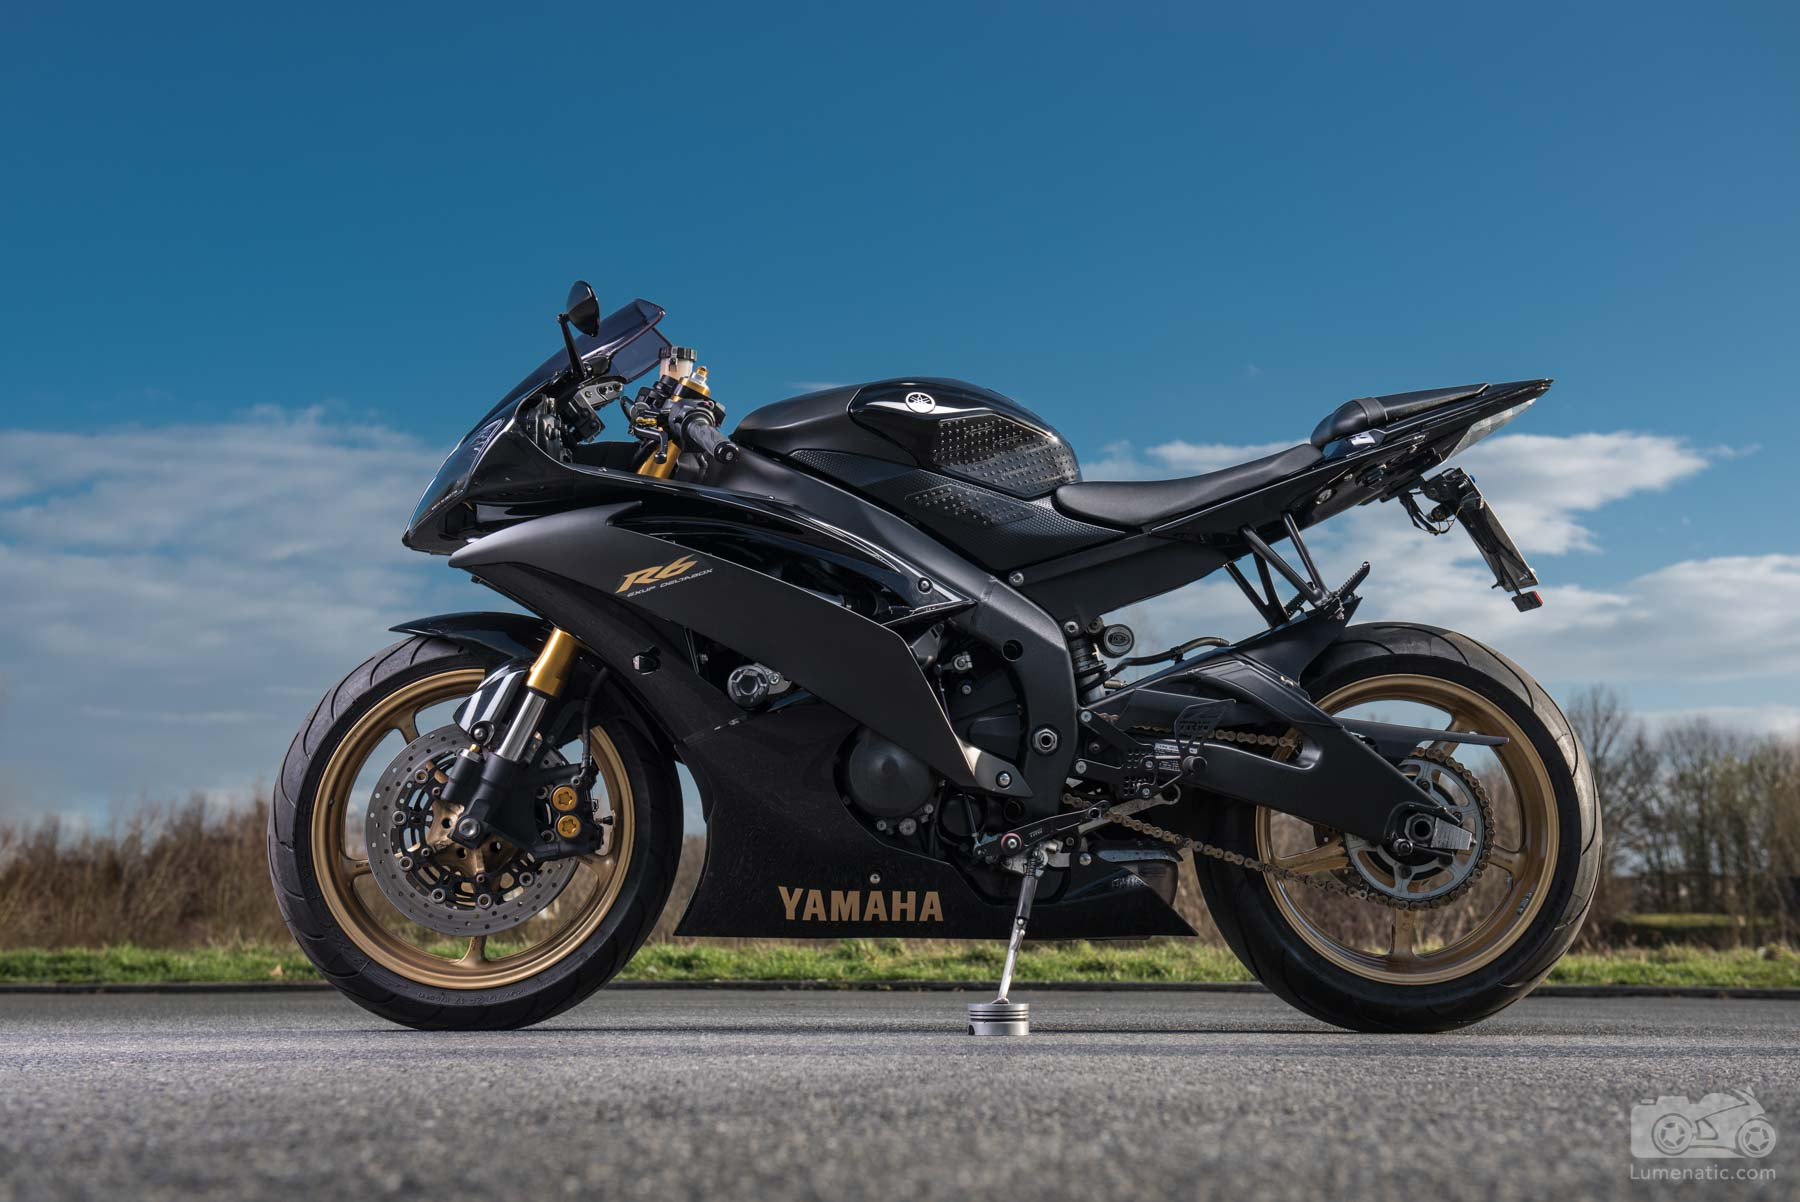 Yamaha YZF-R6 portrait